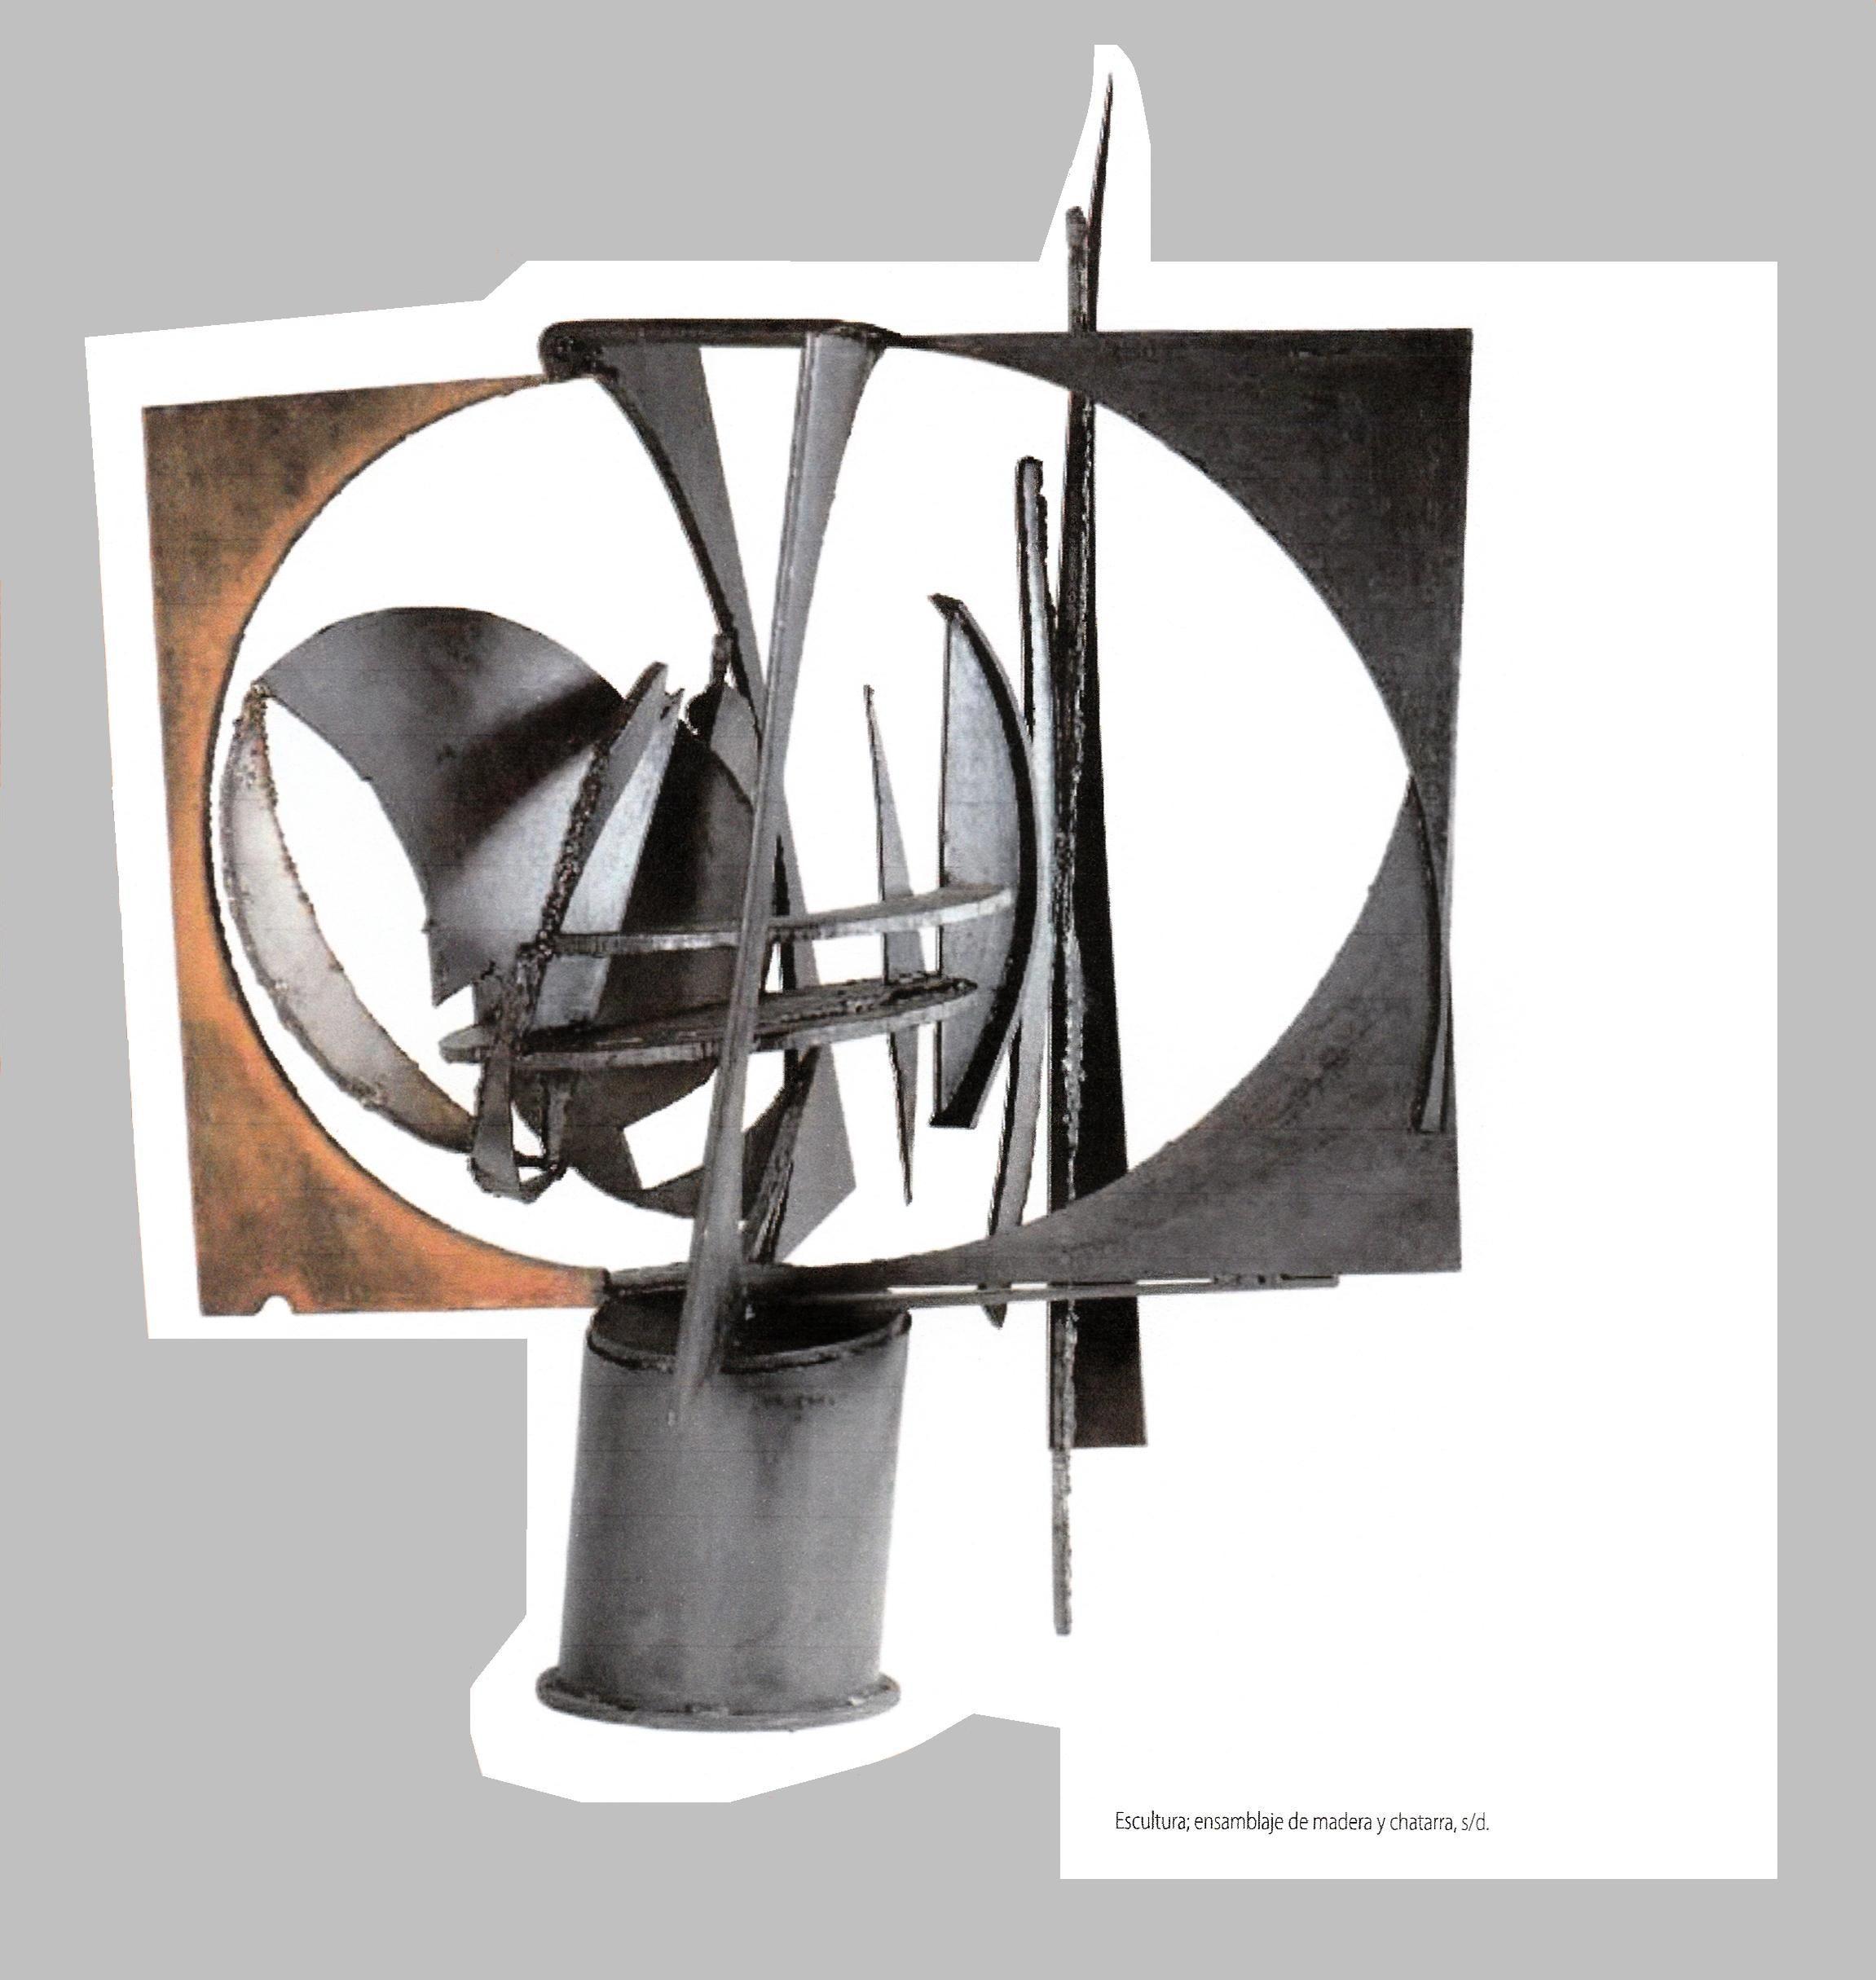 Muebles Podesta - Escultura Chatarra Y Madera Autor Octavi Podest Montevideo [mjhdah]https://http2.mlstatic.com/amoblamiento-cocina-muebles-D_NQ_NP_4664-MLA4925351509_082013-F.jpg